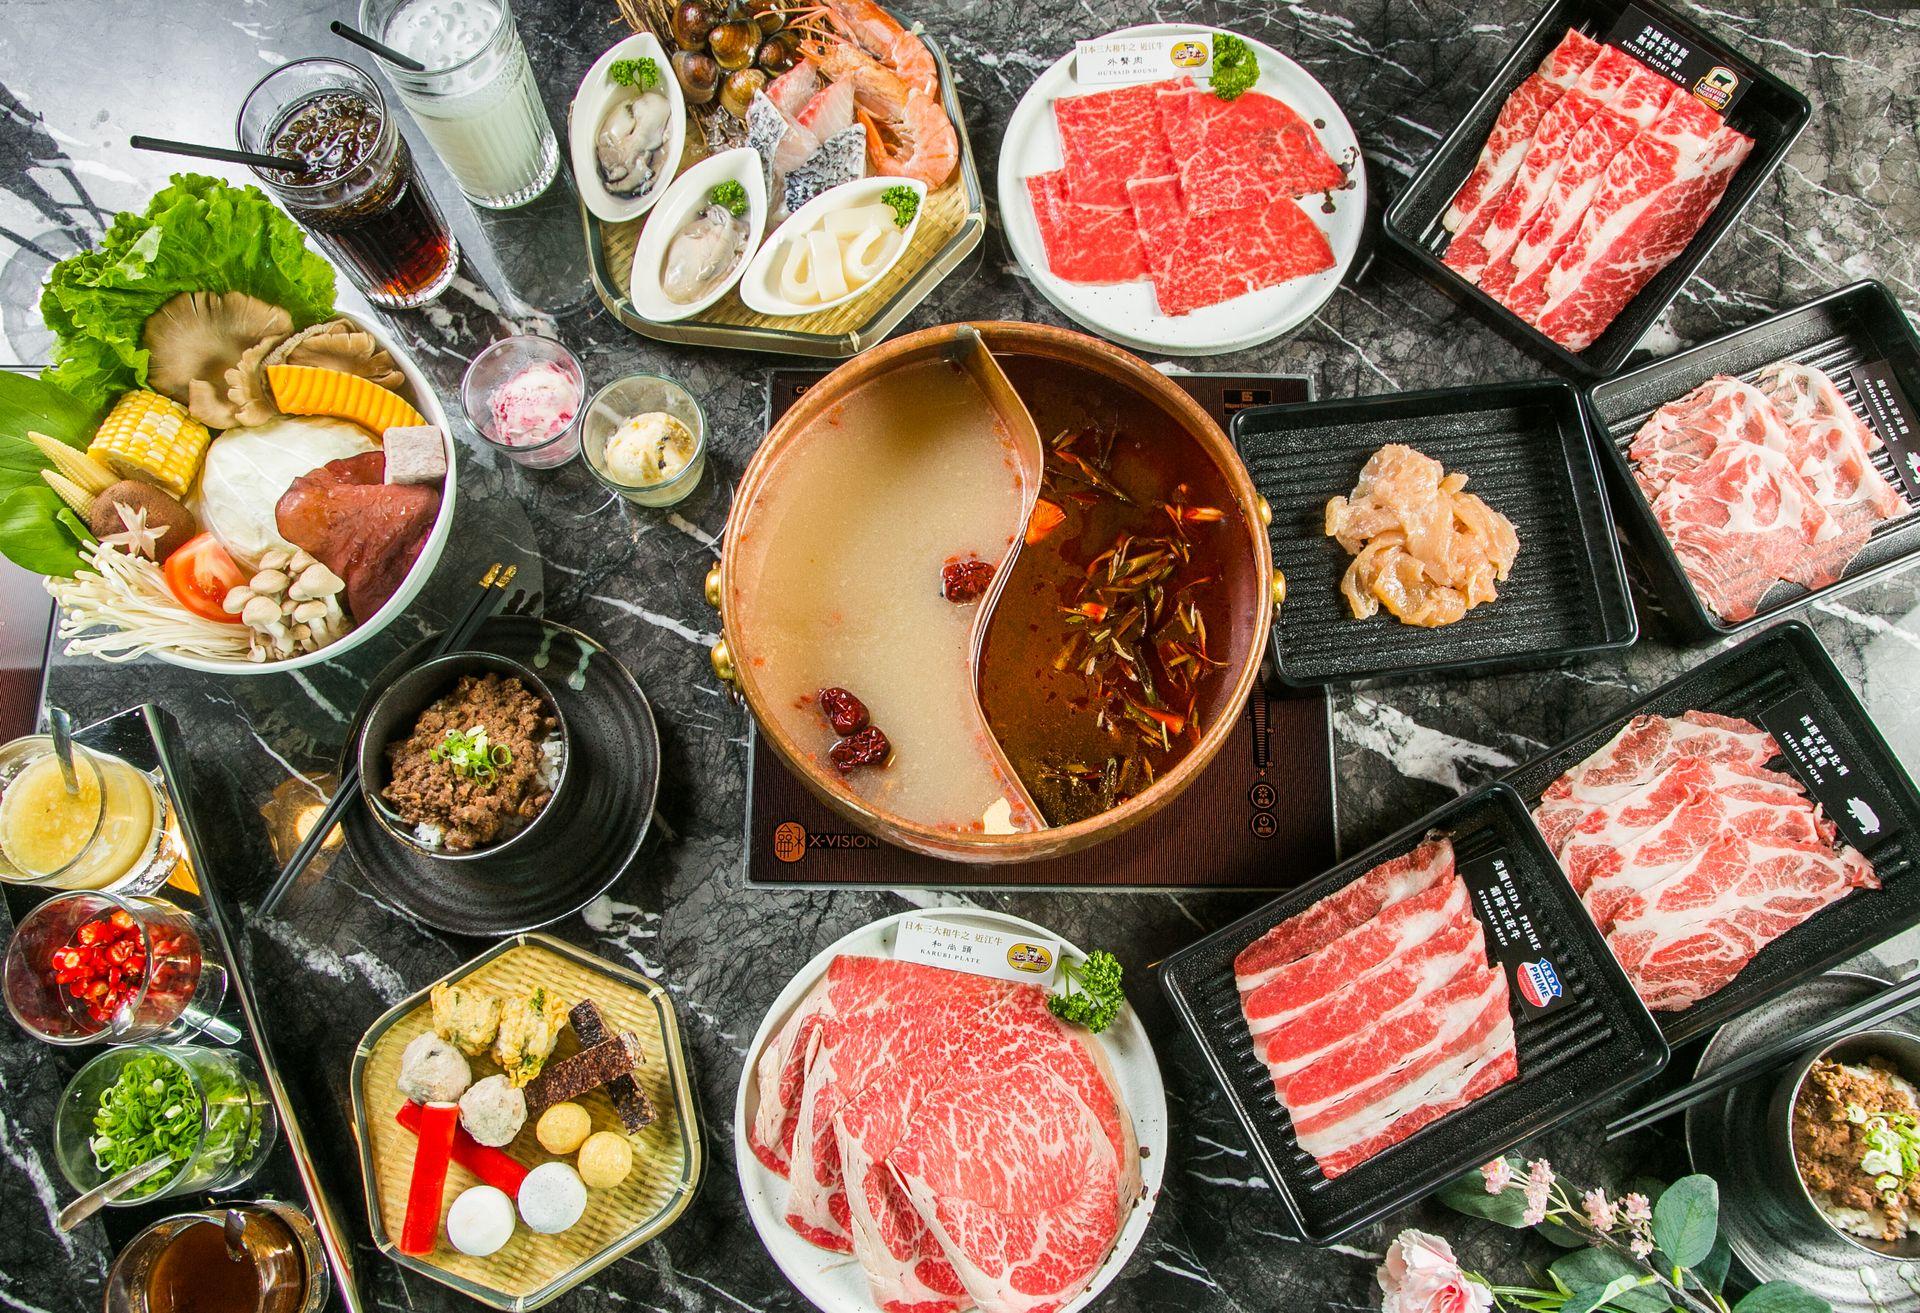 Beef King供應琳瑯滿目的A5和牛和多種肉品選擇。